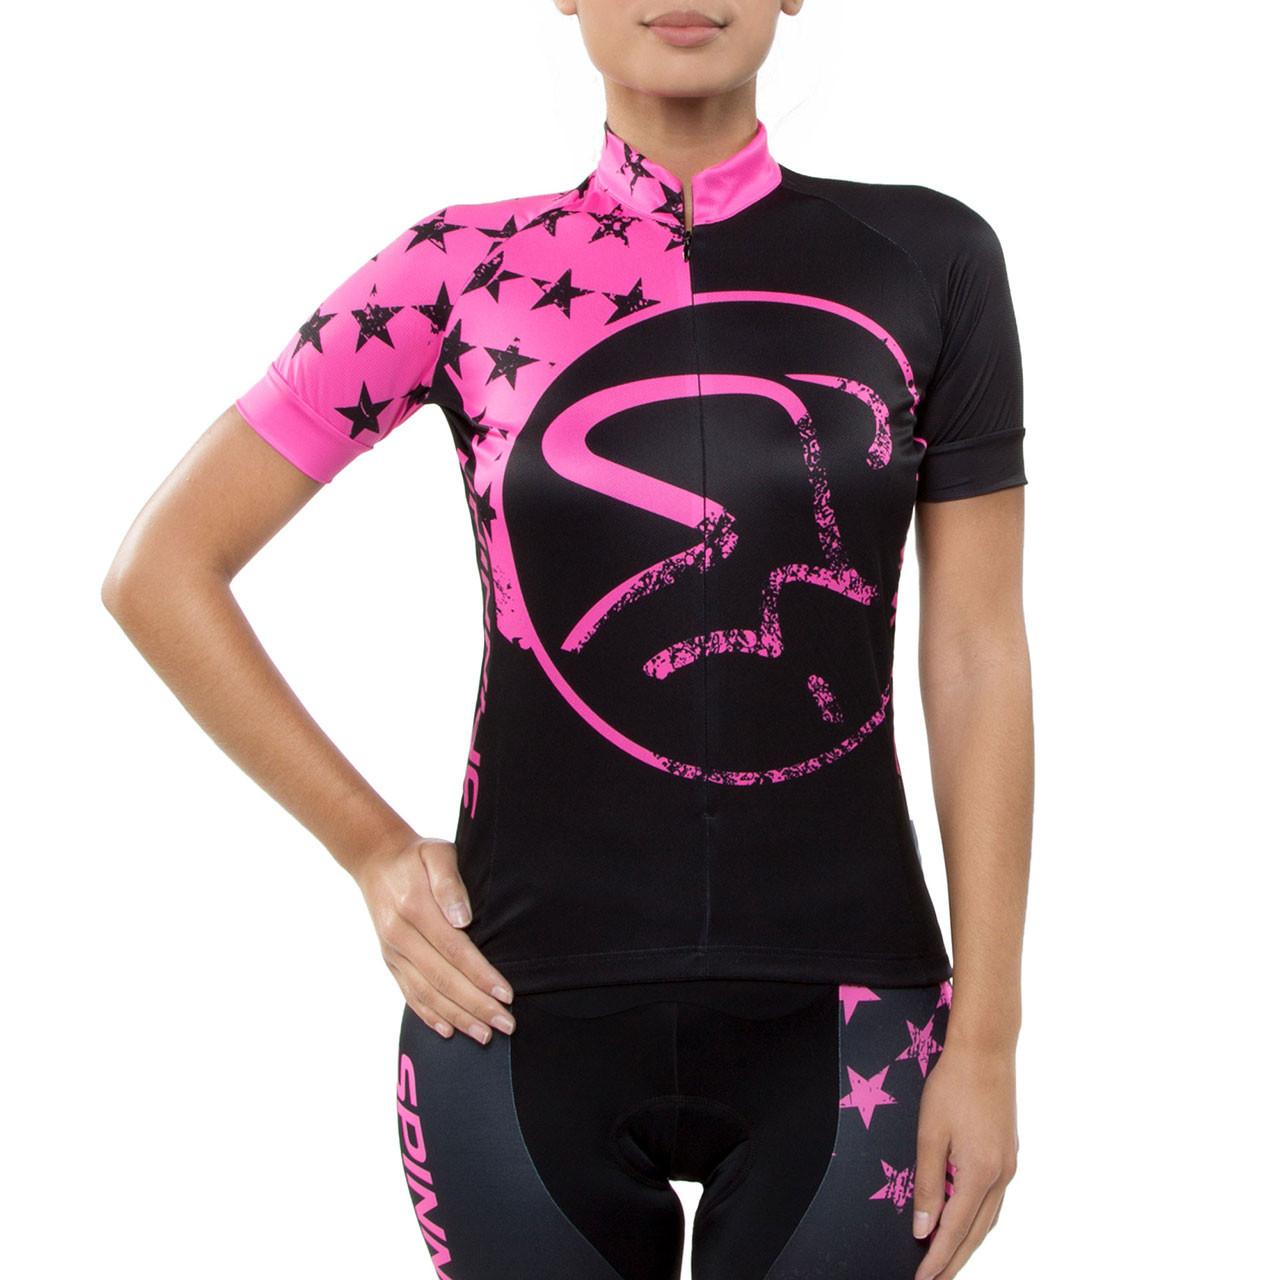 2817c259 Spinning® Gemini Women's Cycling Jersey Pink